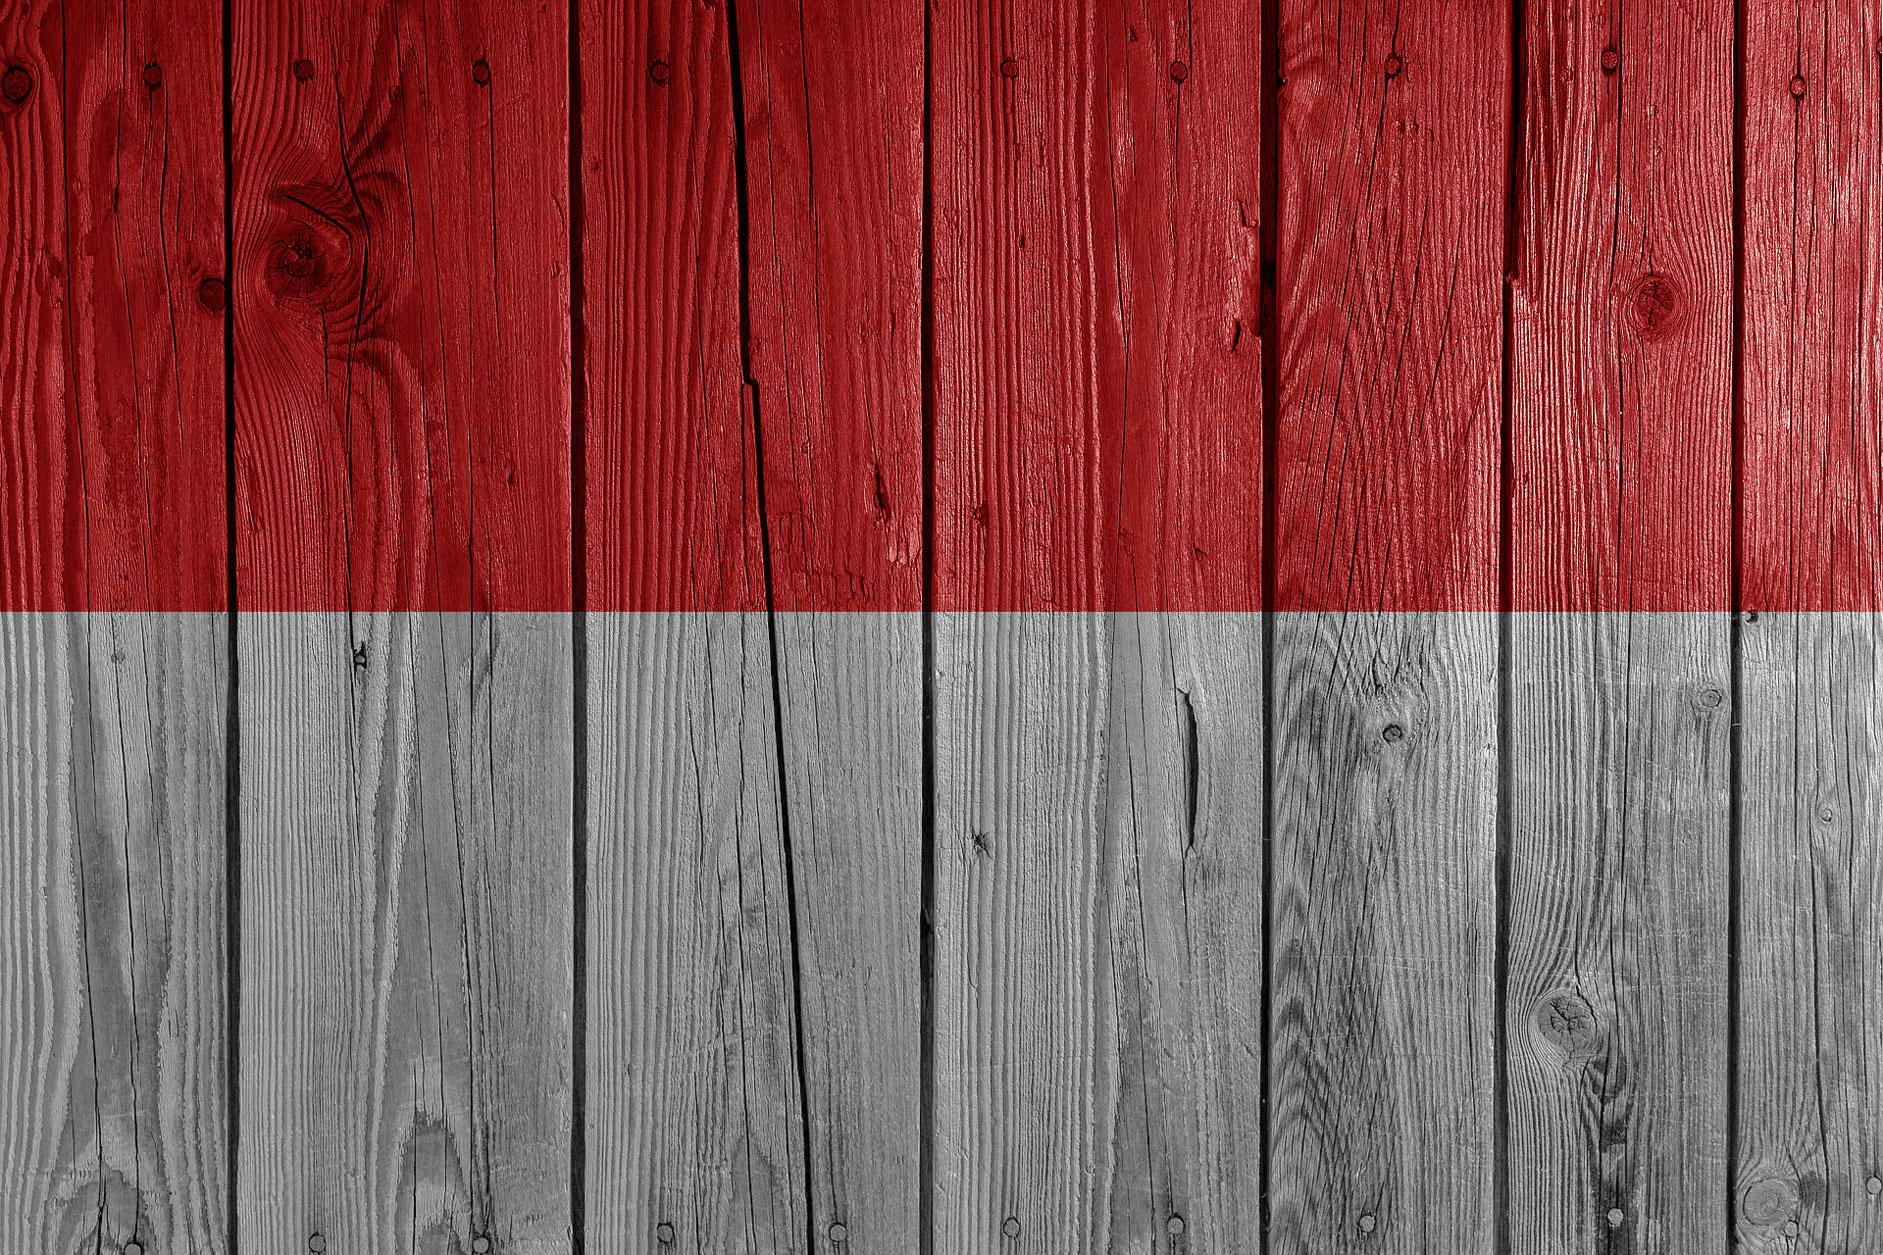 koleksi background bendera merah putih keren mas vian koleksi background bendera merah putih